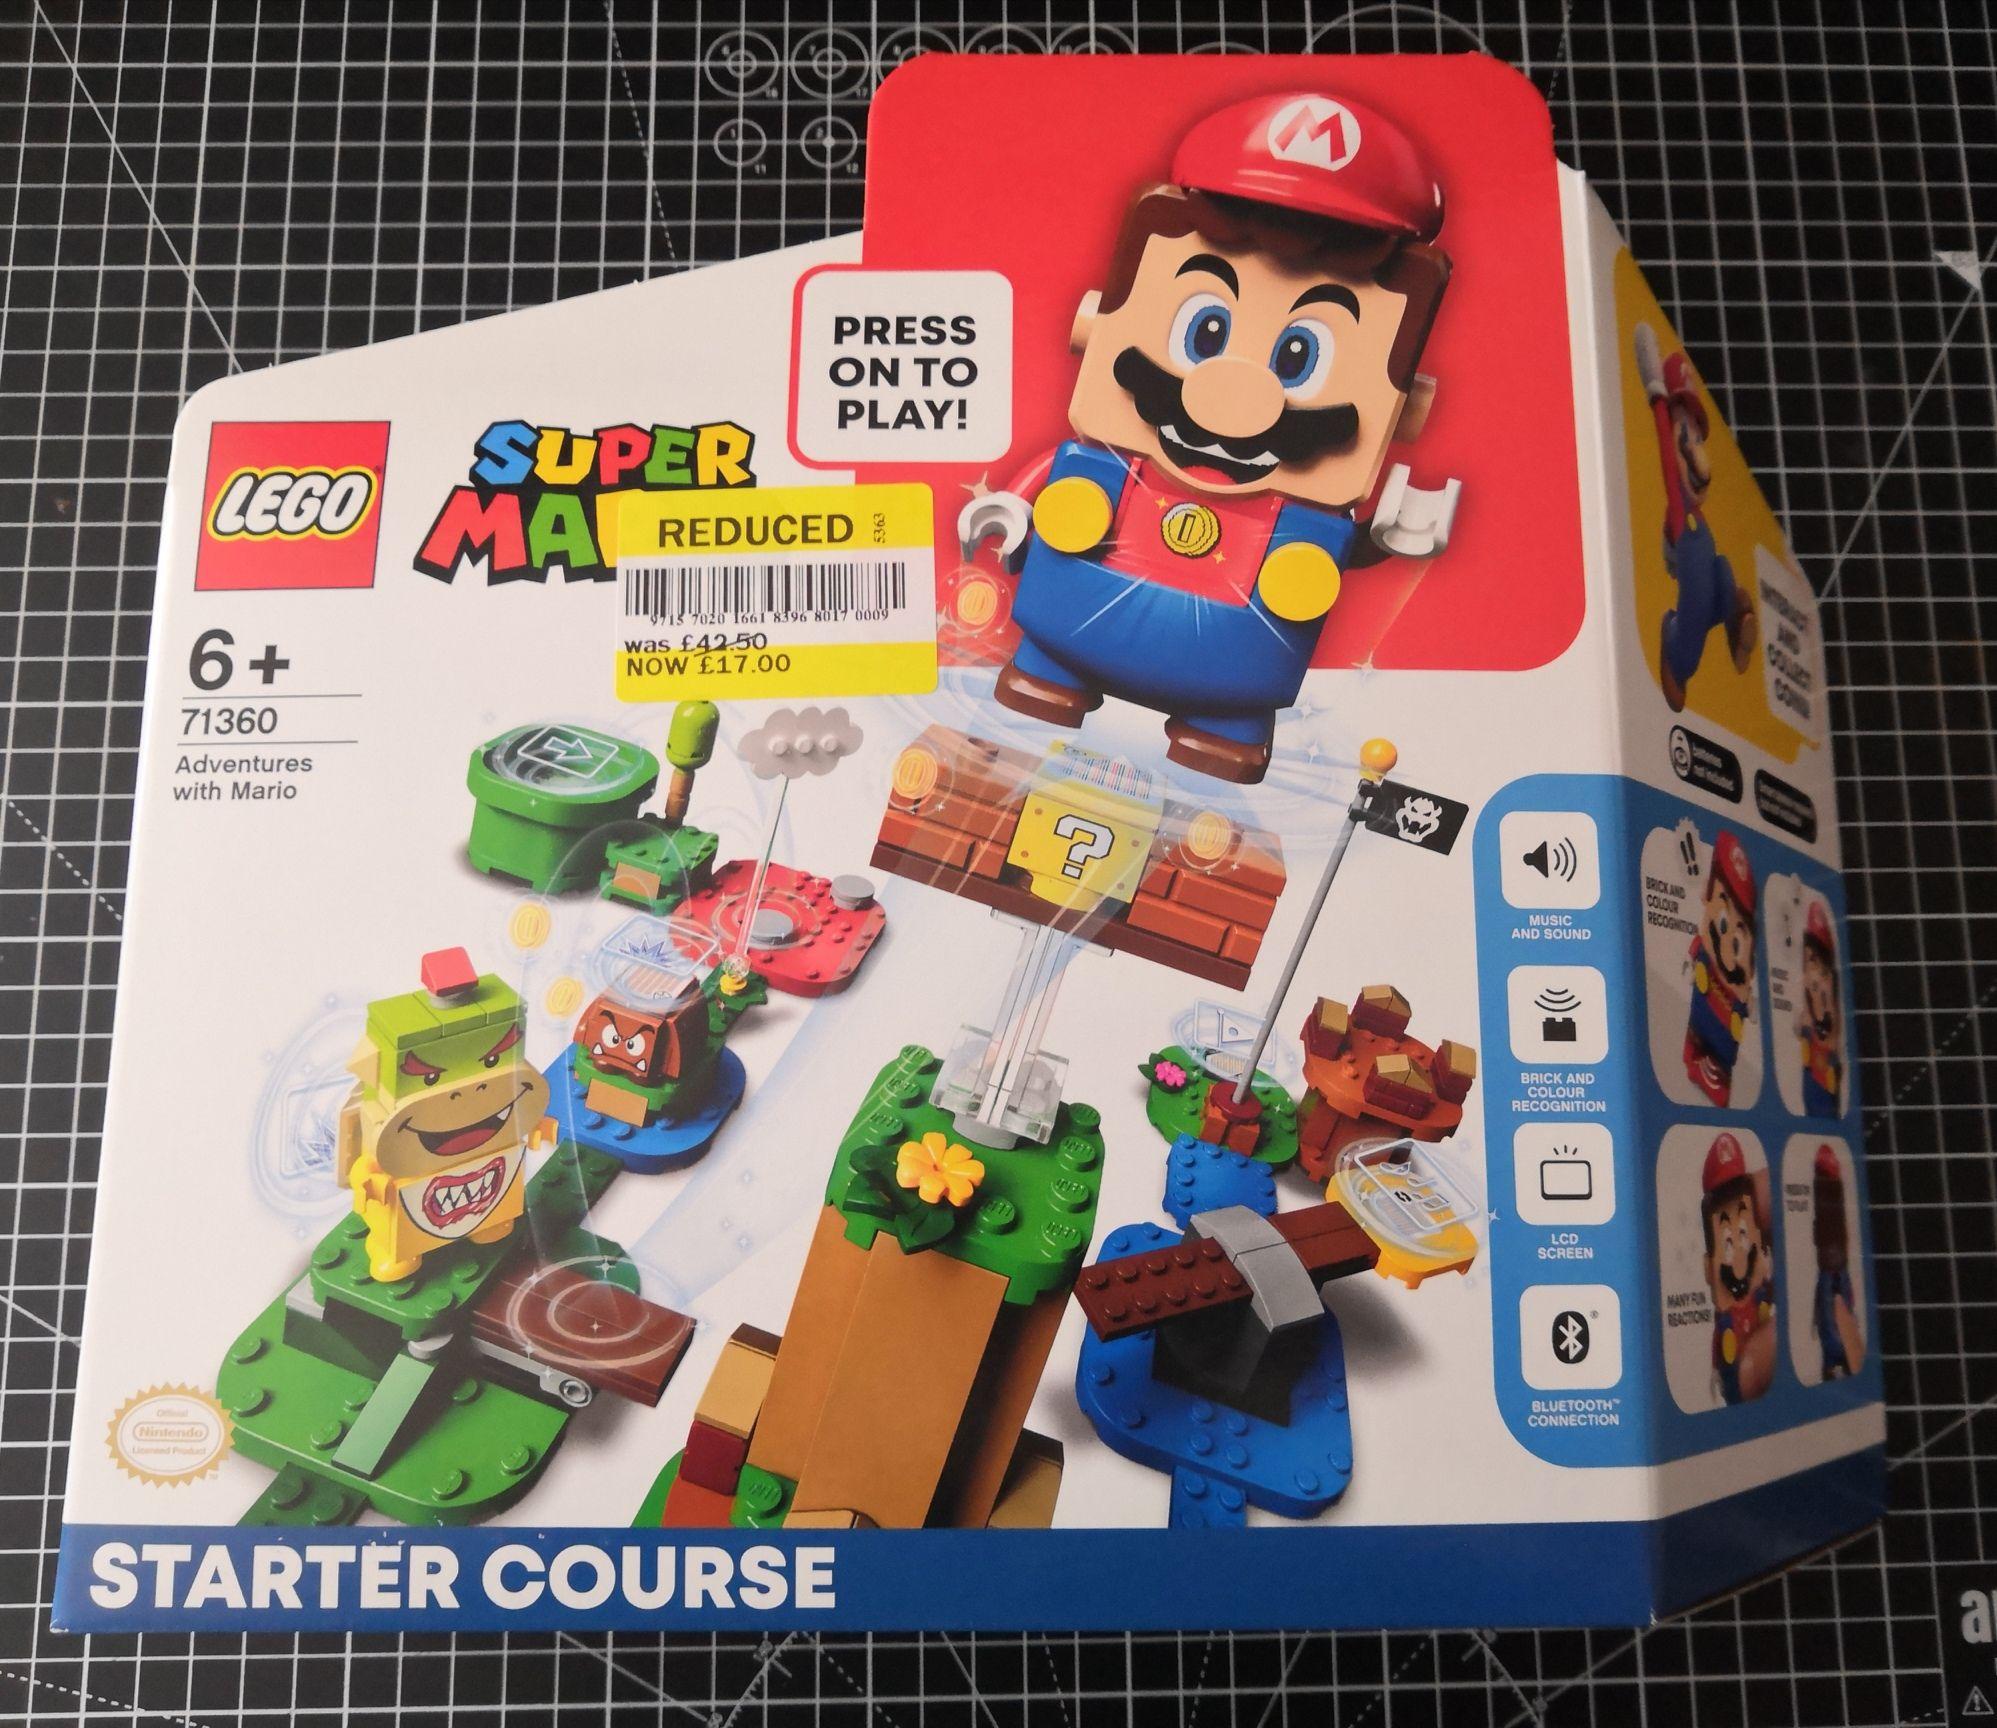 Lego Super Mario Starter Course 71360 - £17 at Tesco Brockworth instore